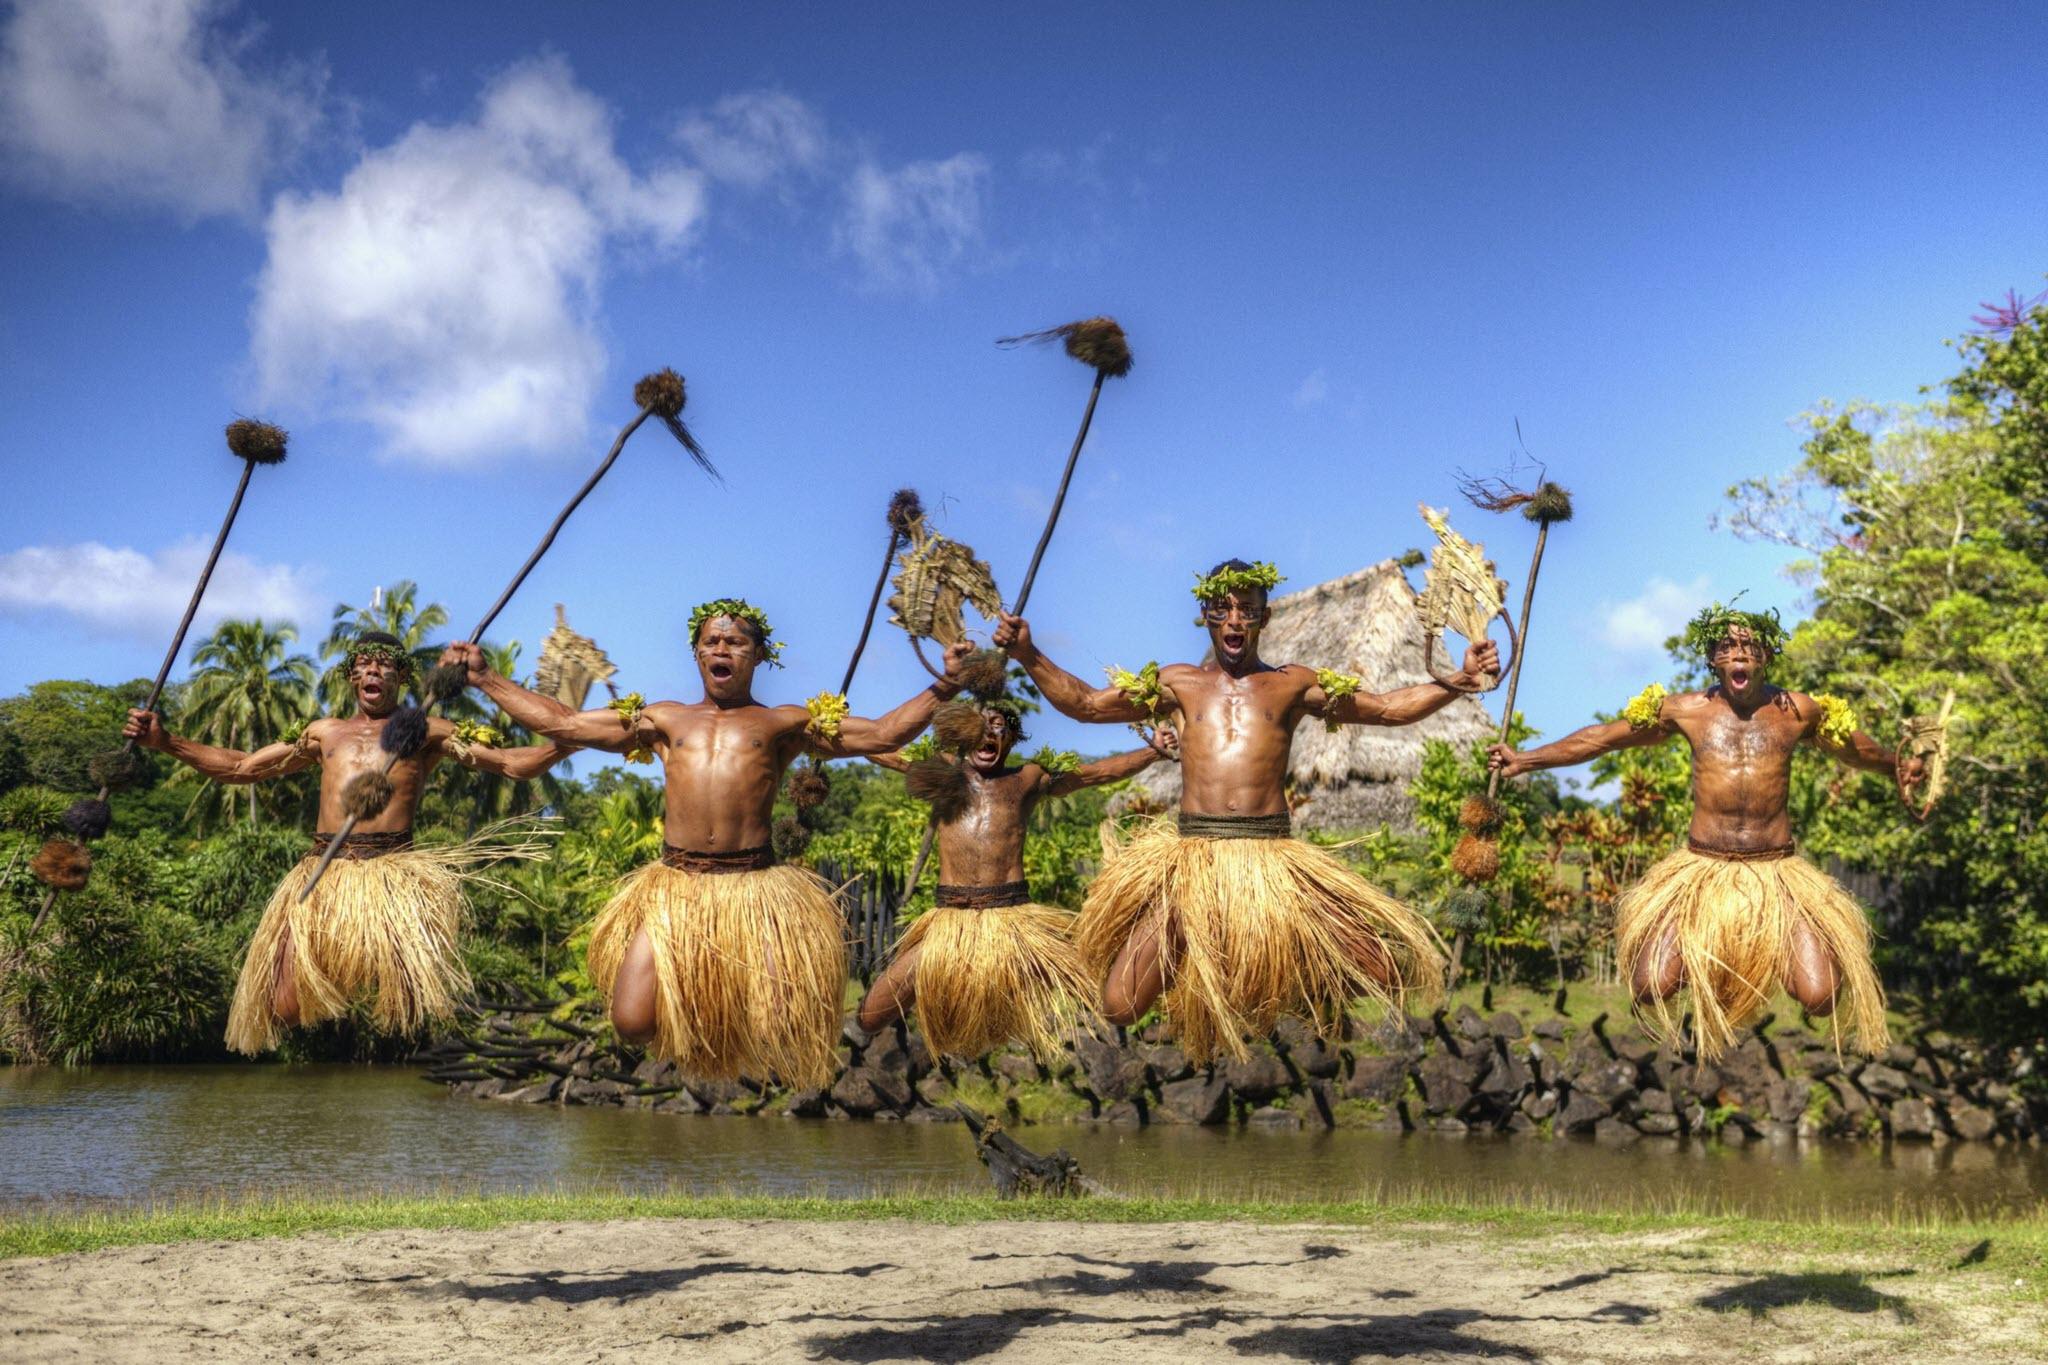 Fijian Warrior Dance